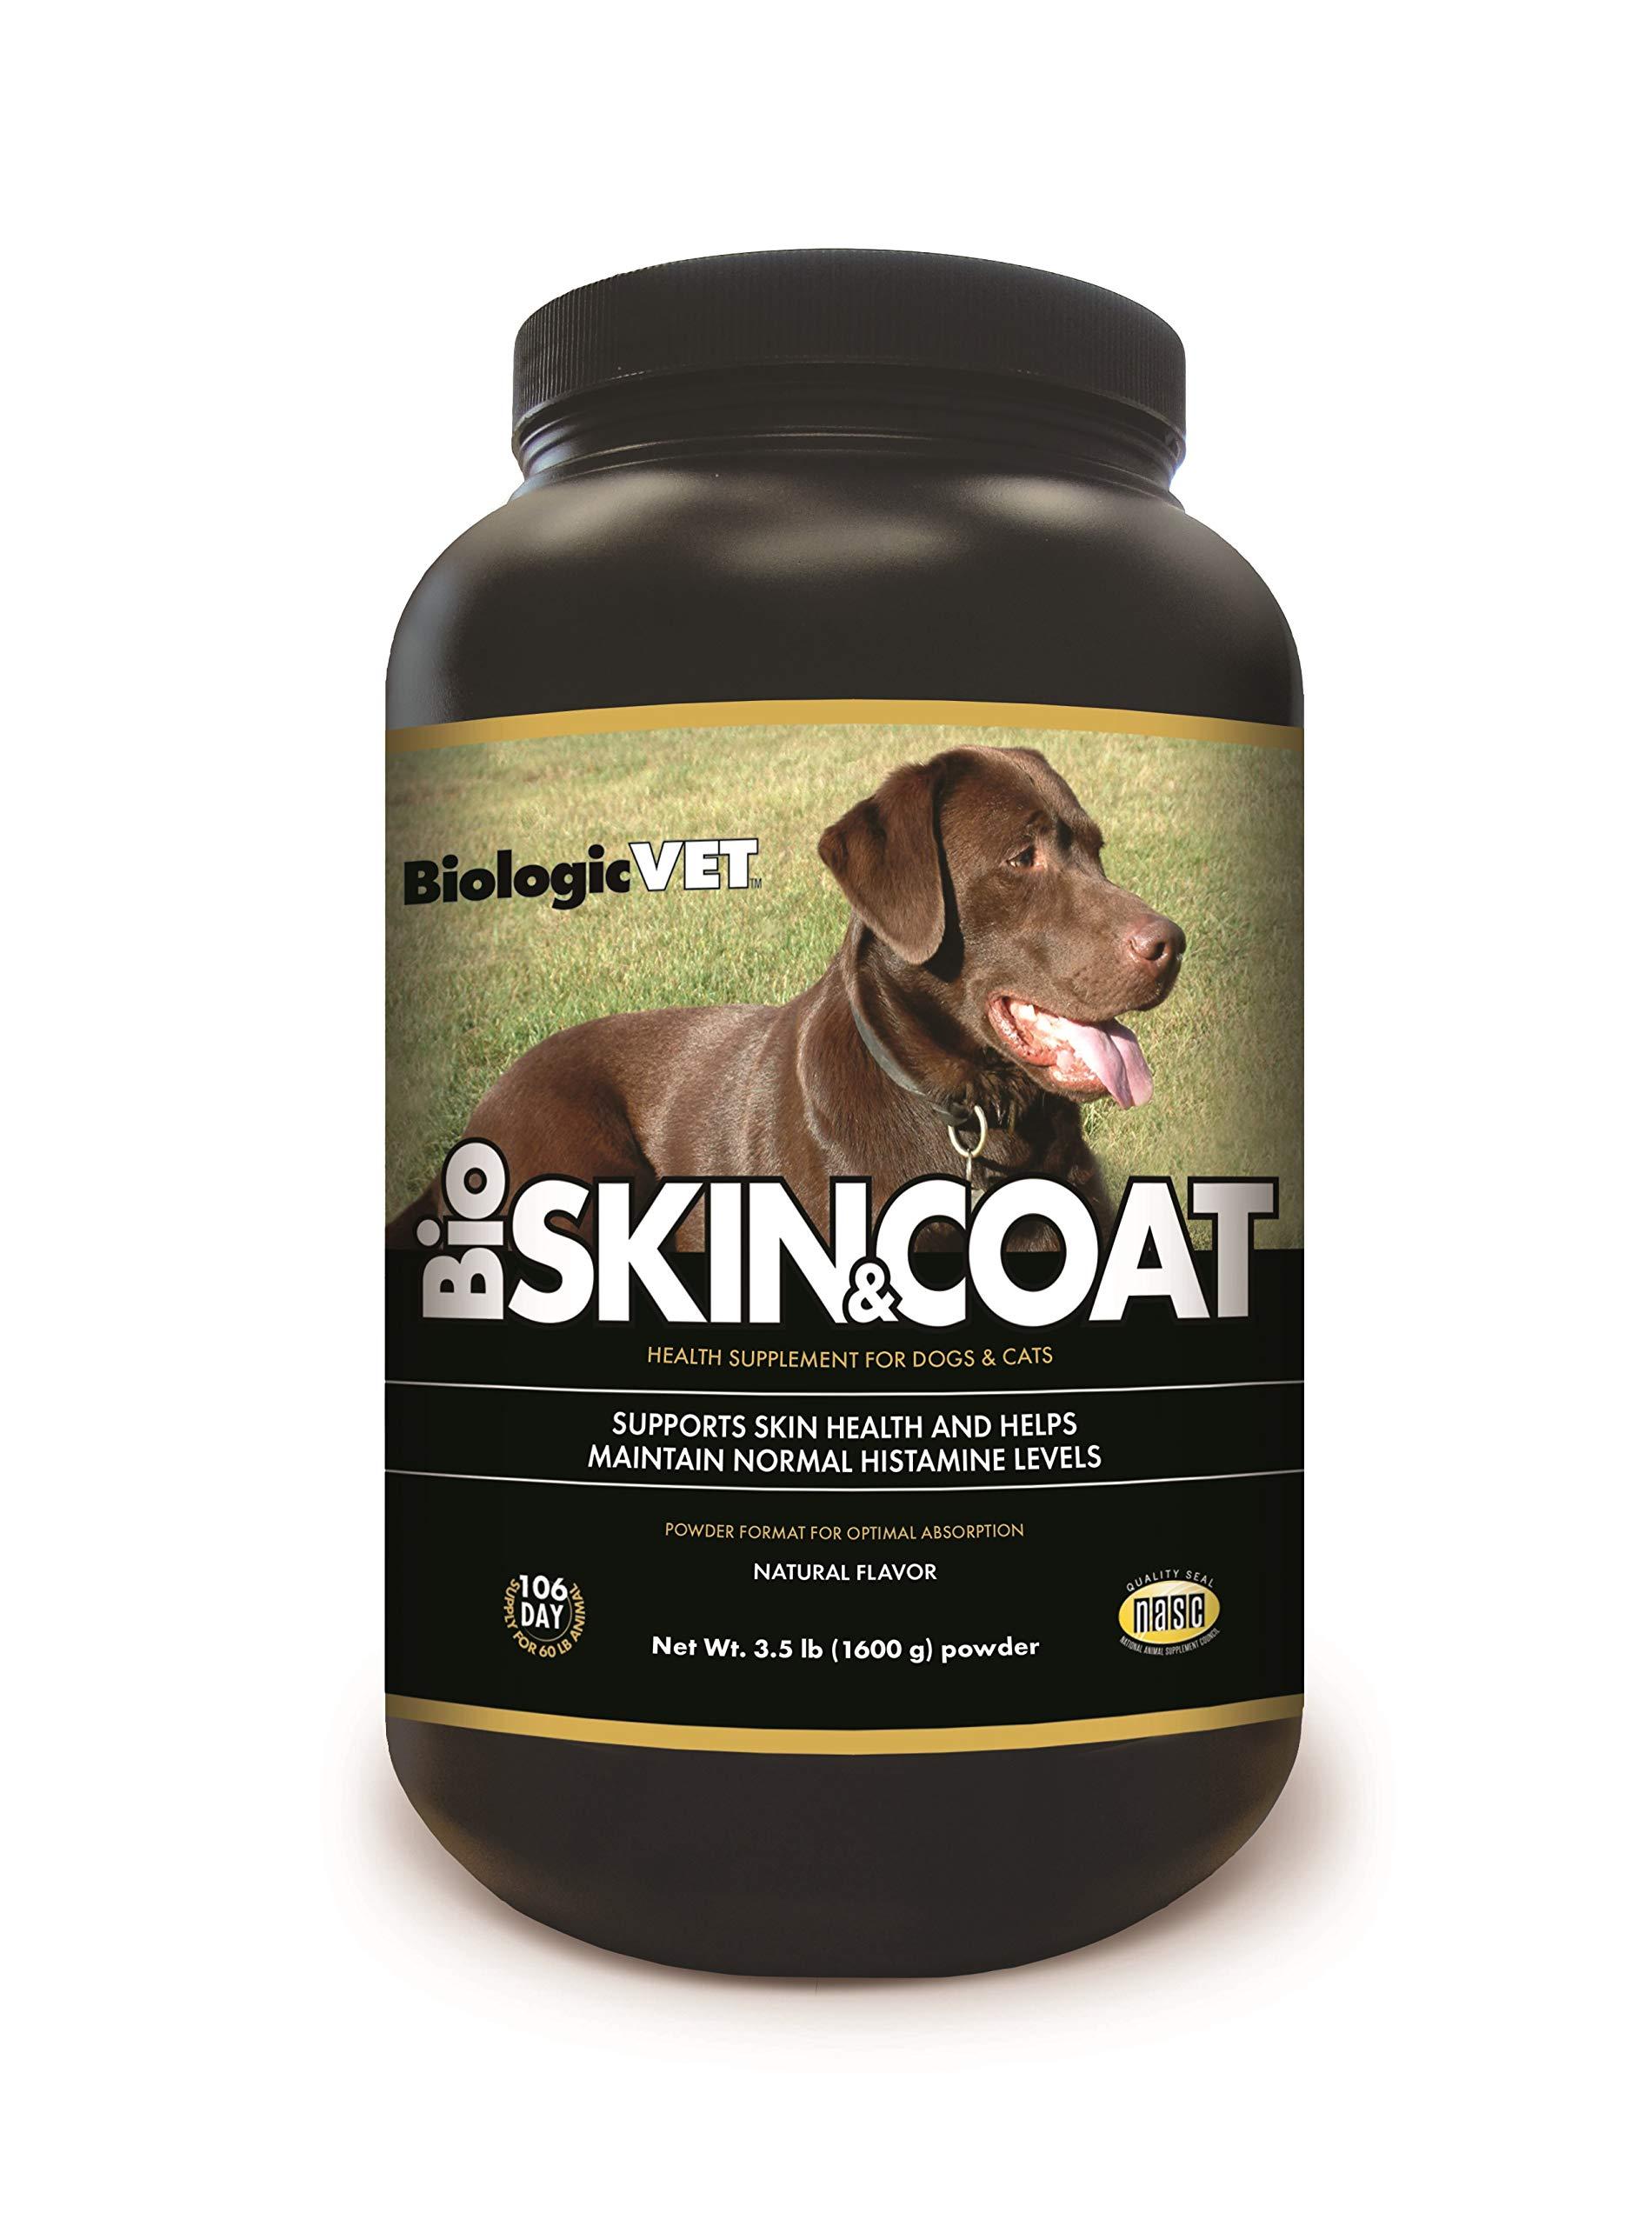 BiologicVET Bioskin&Coat Natural Antihistamine for Dogs & Cats Powder, 3.5 lb by BiologicVET